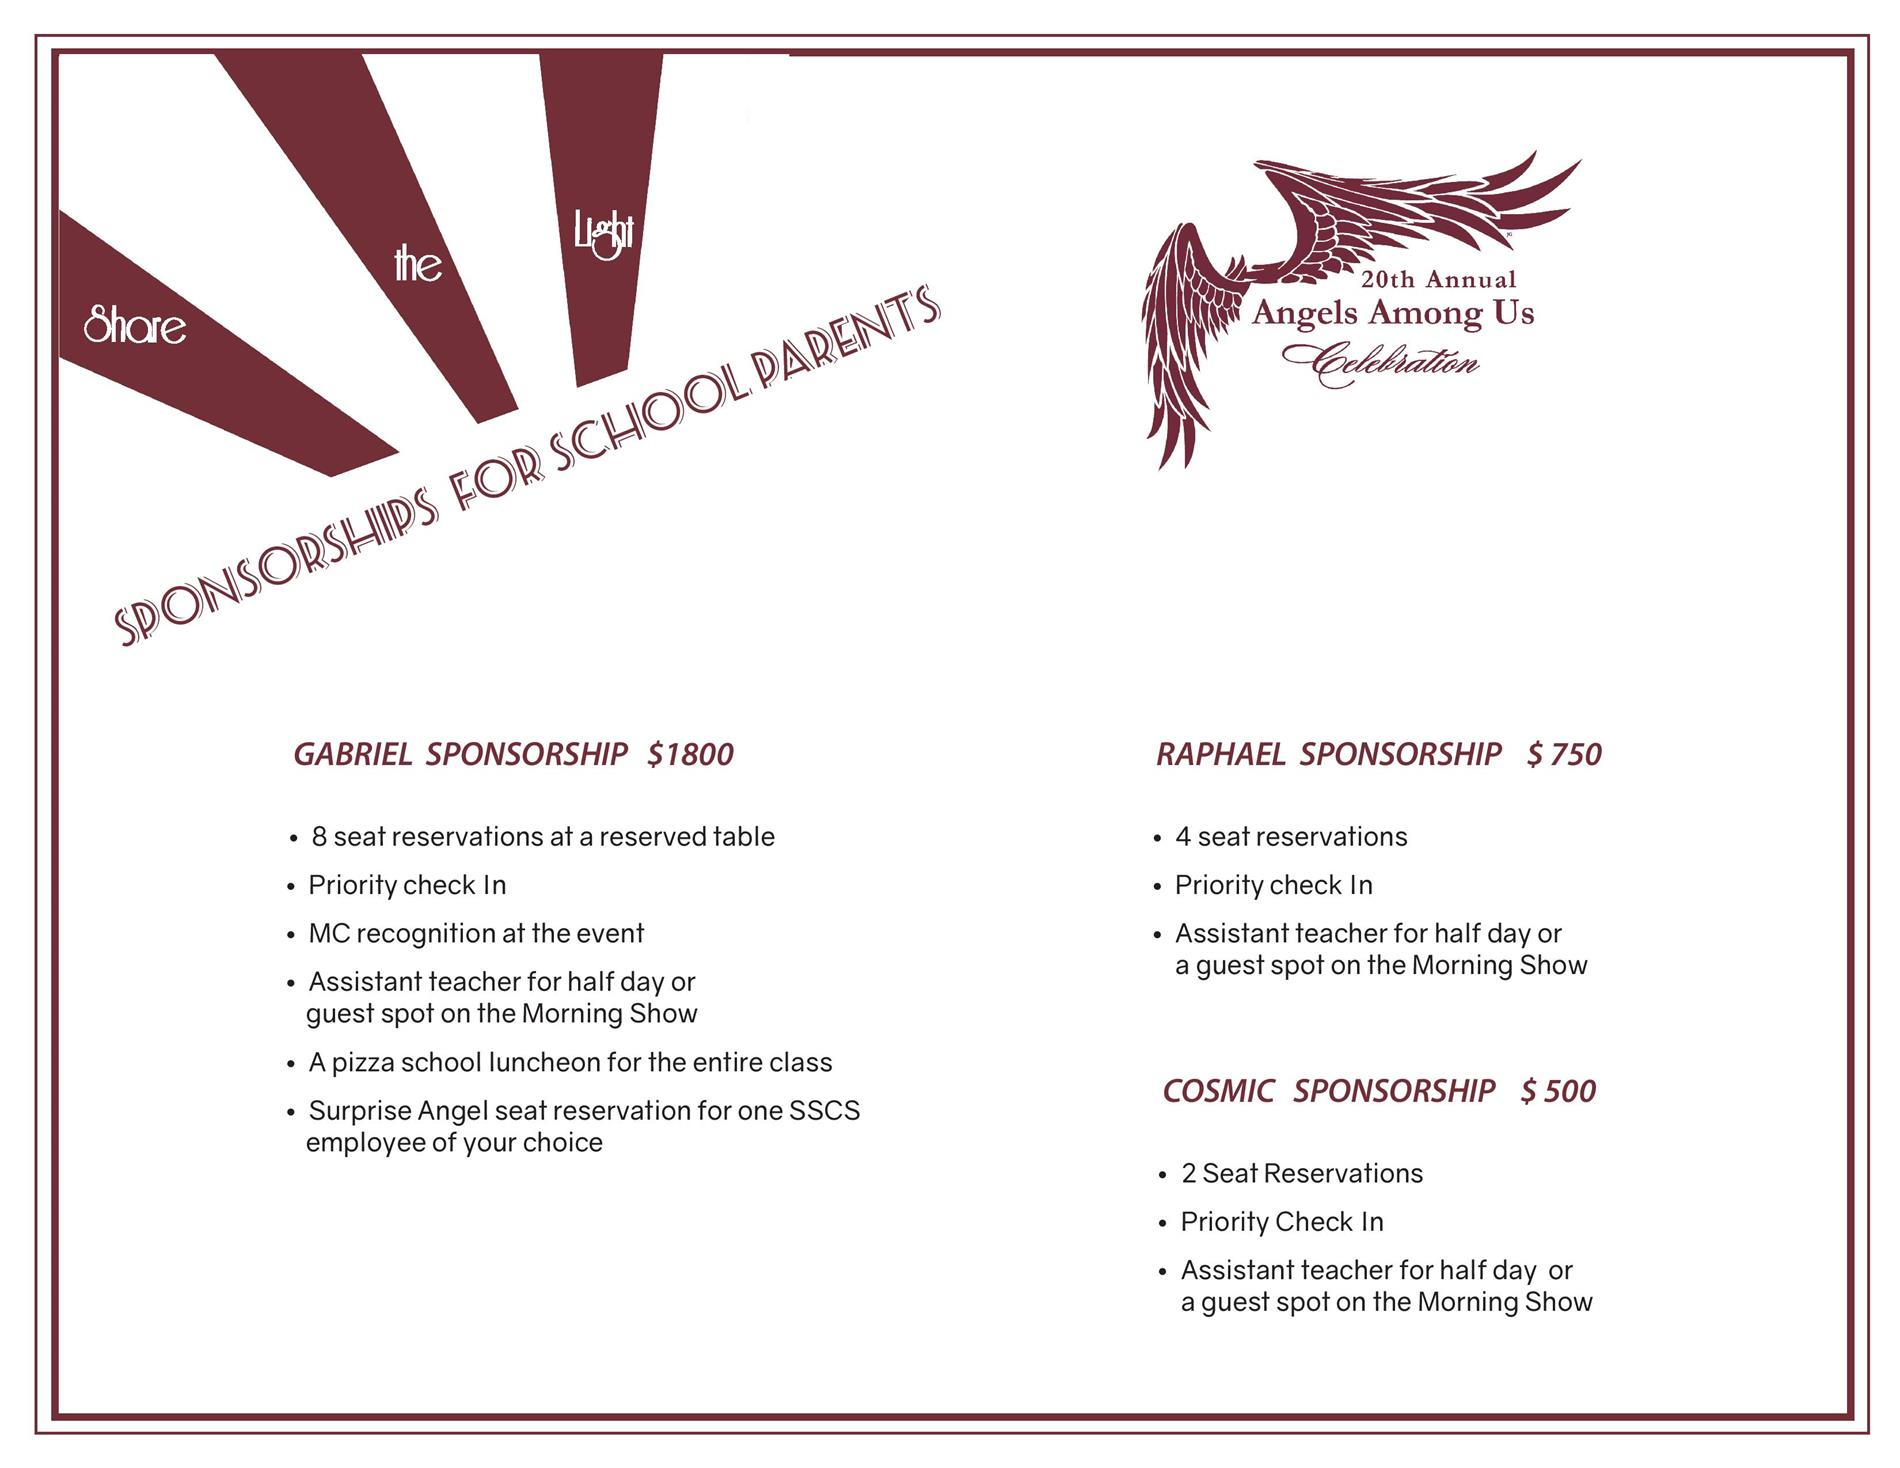 Sponsorships for School Parents